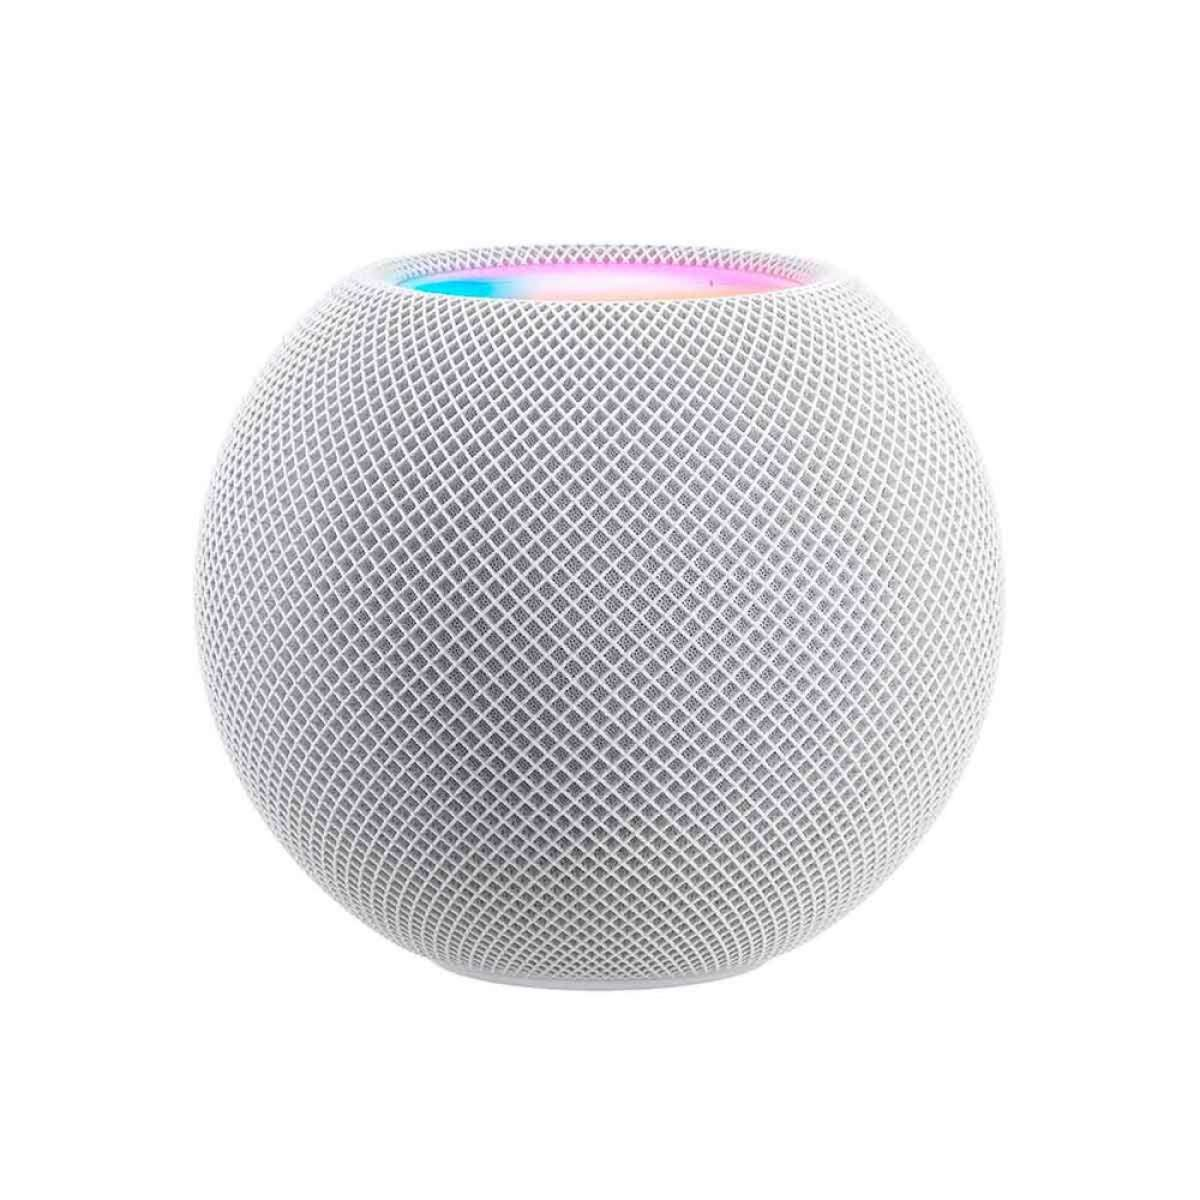 ⭐️ Apple HomePod mini (2020) White (MY5H2) ⭐️4 599 грн.⭐️ фото 1